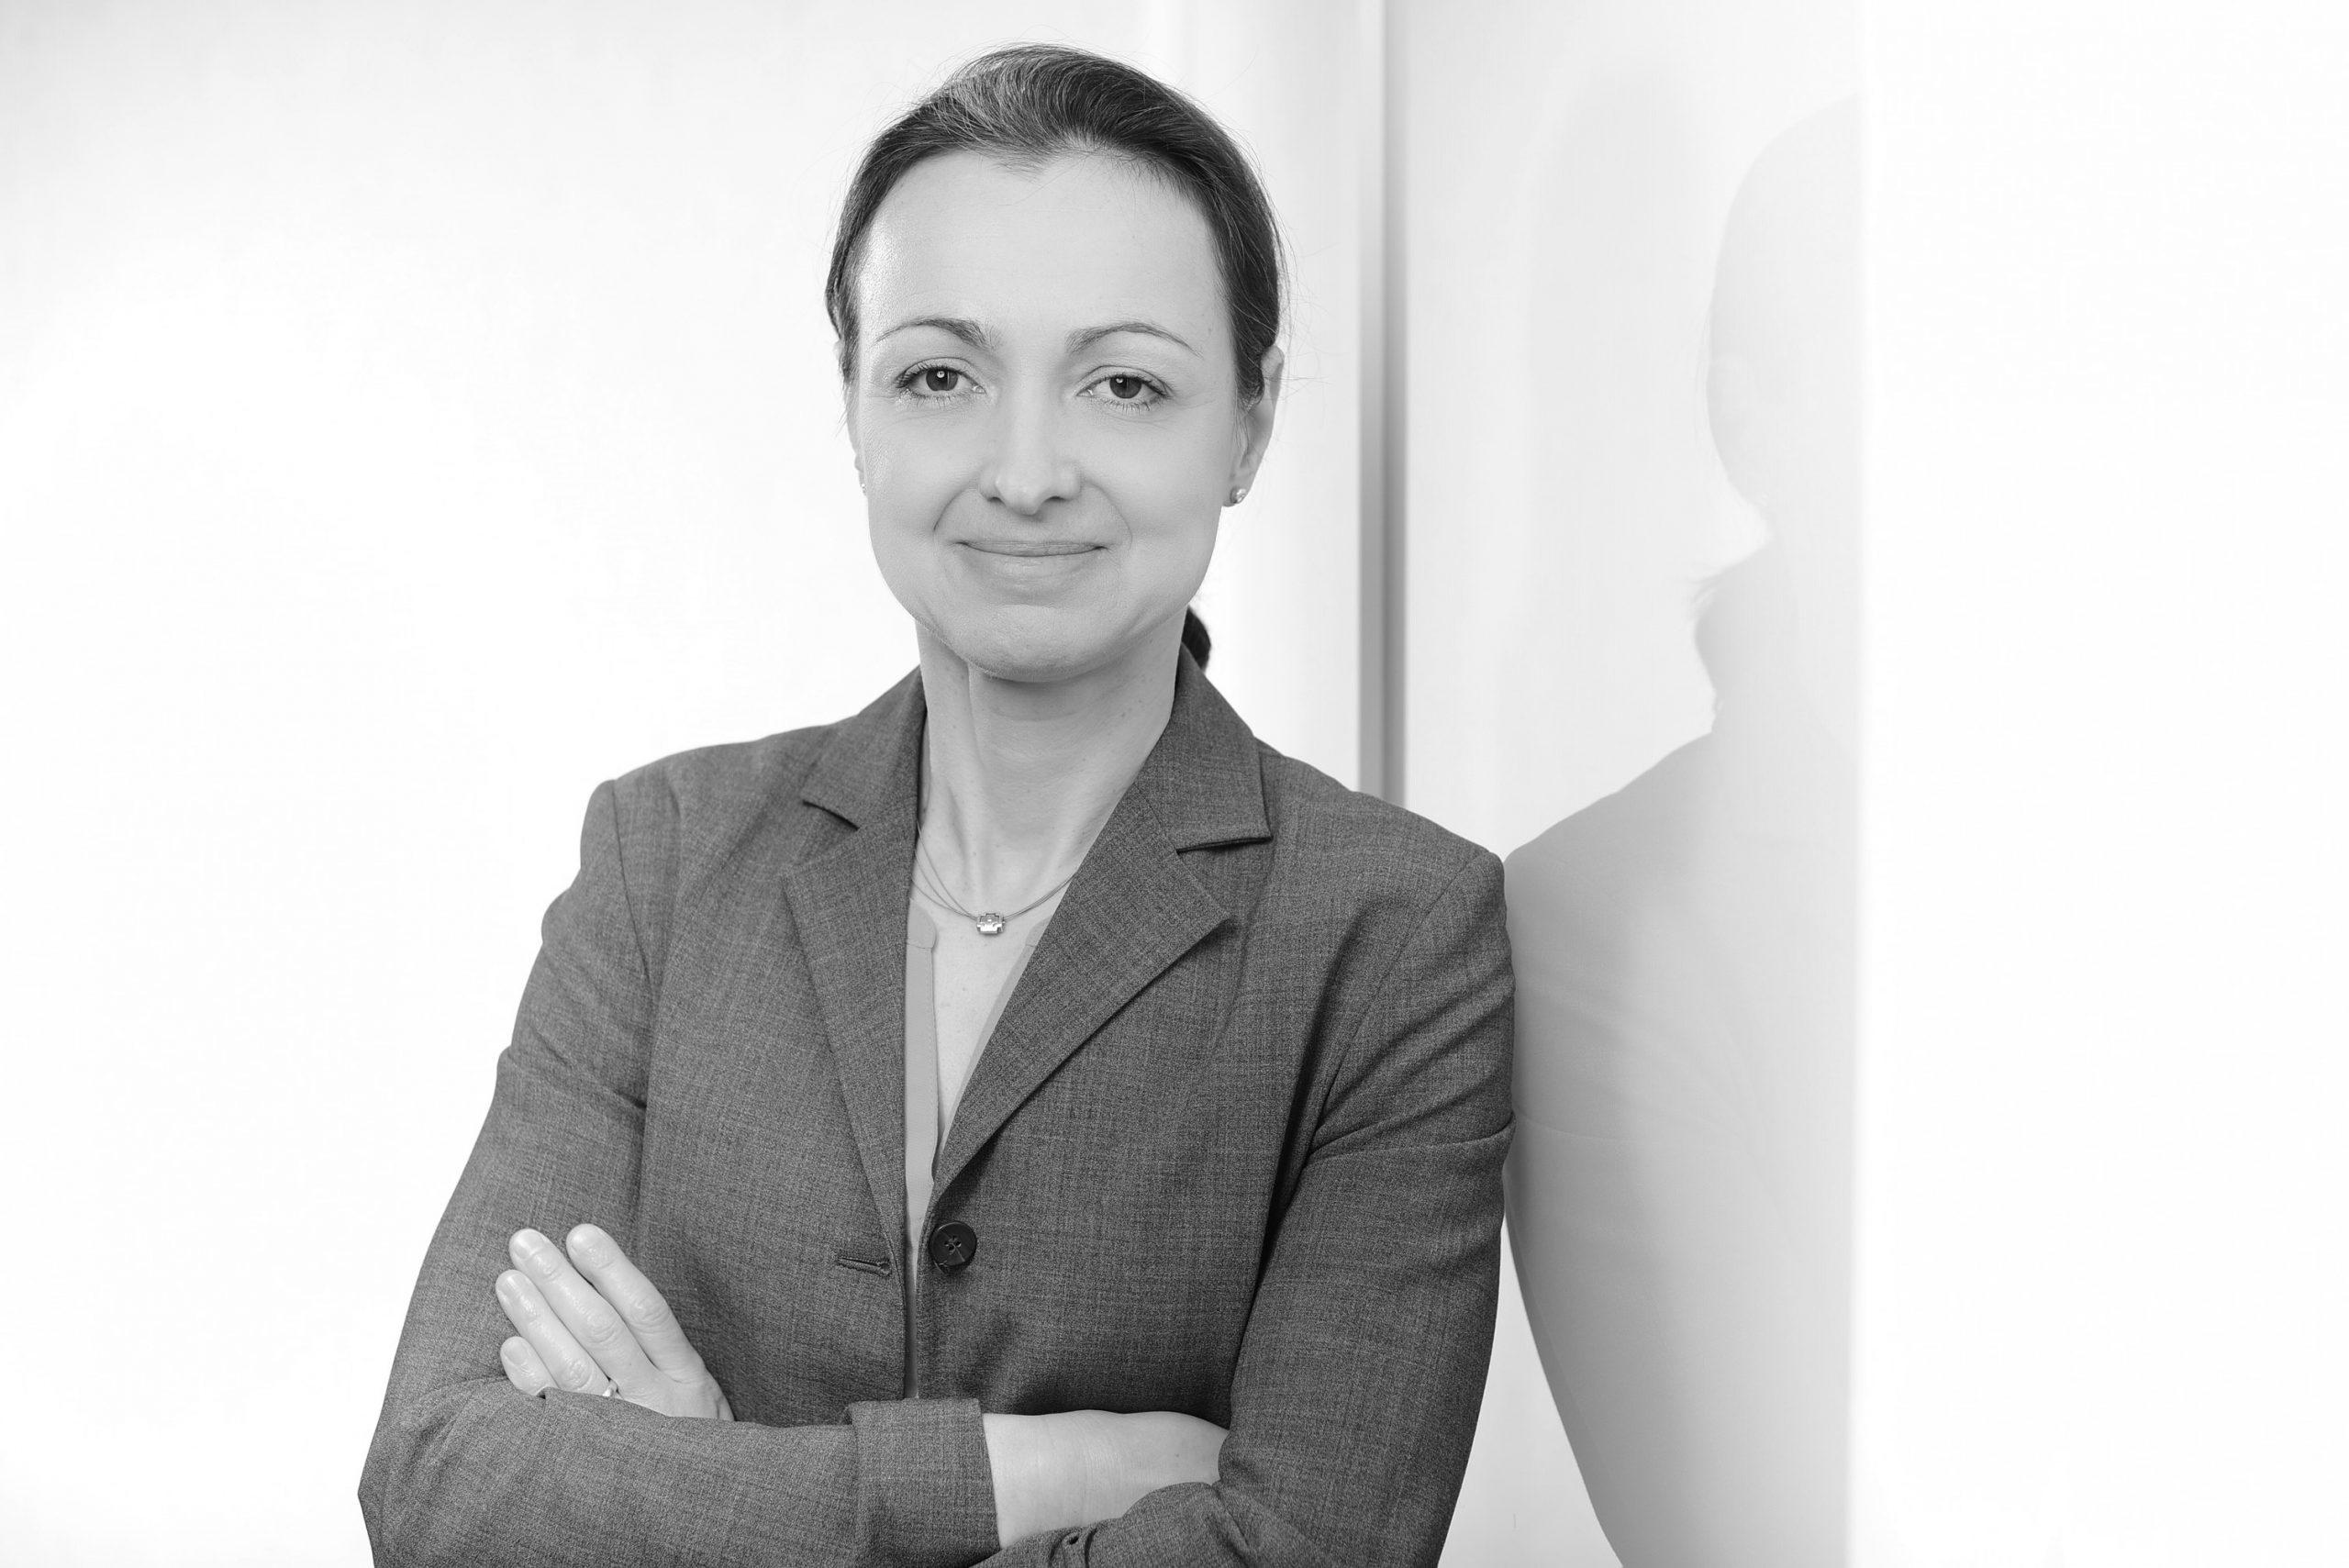 Véronique Hess